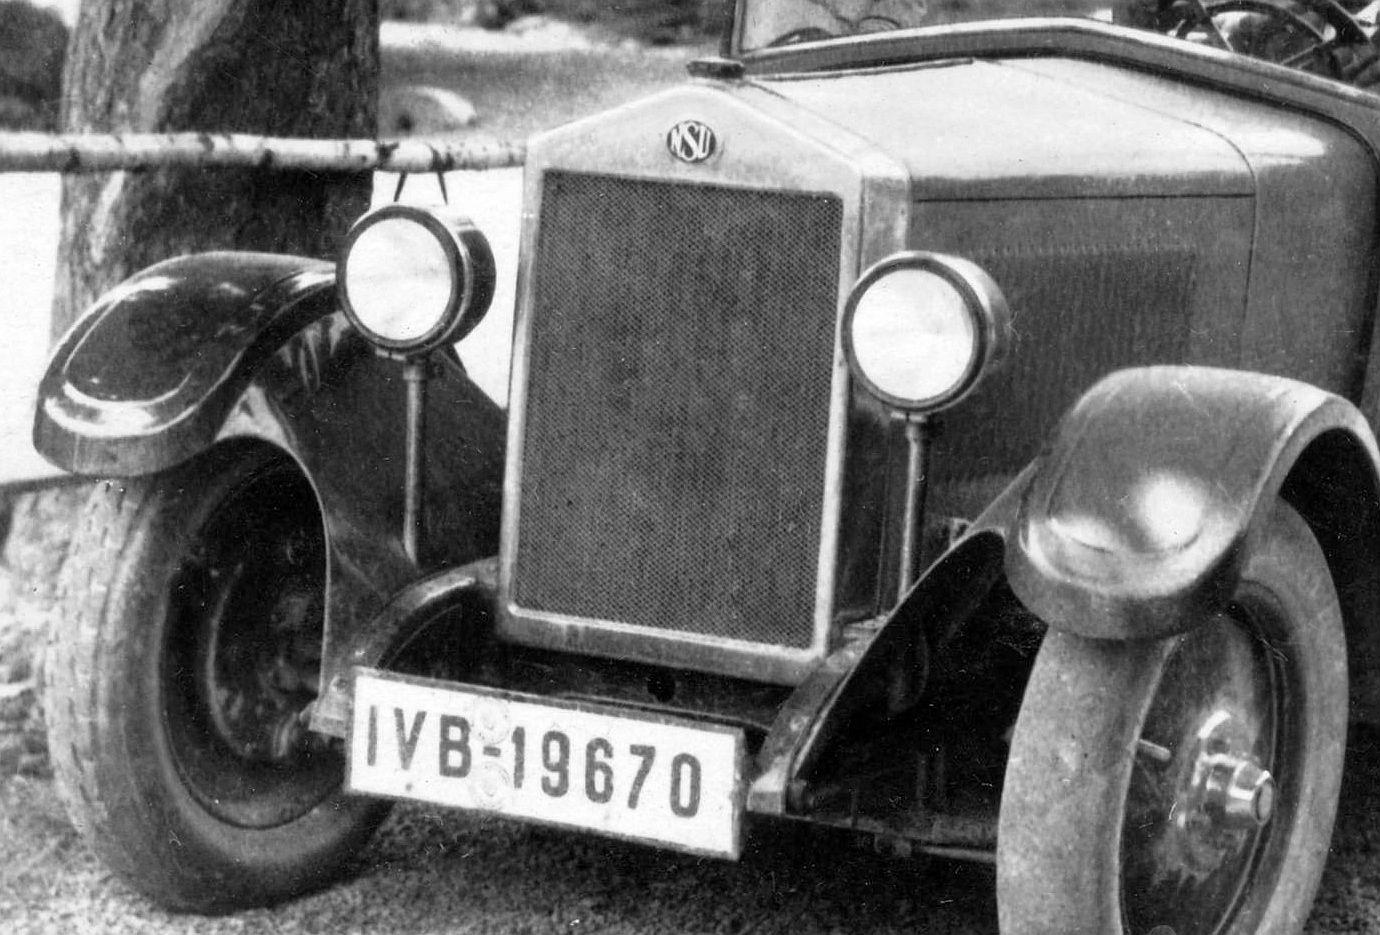 NSU_6-30_PS_Hardheim_08-1928_Ausschnitt